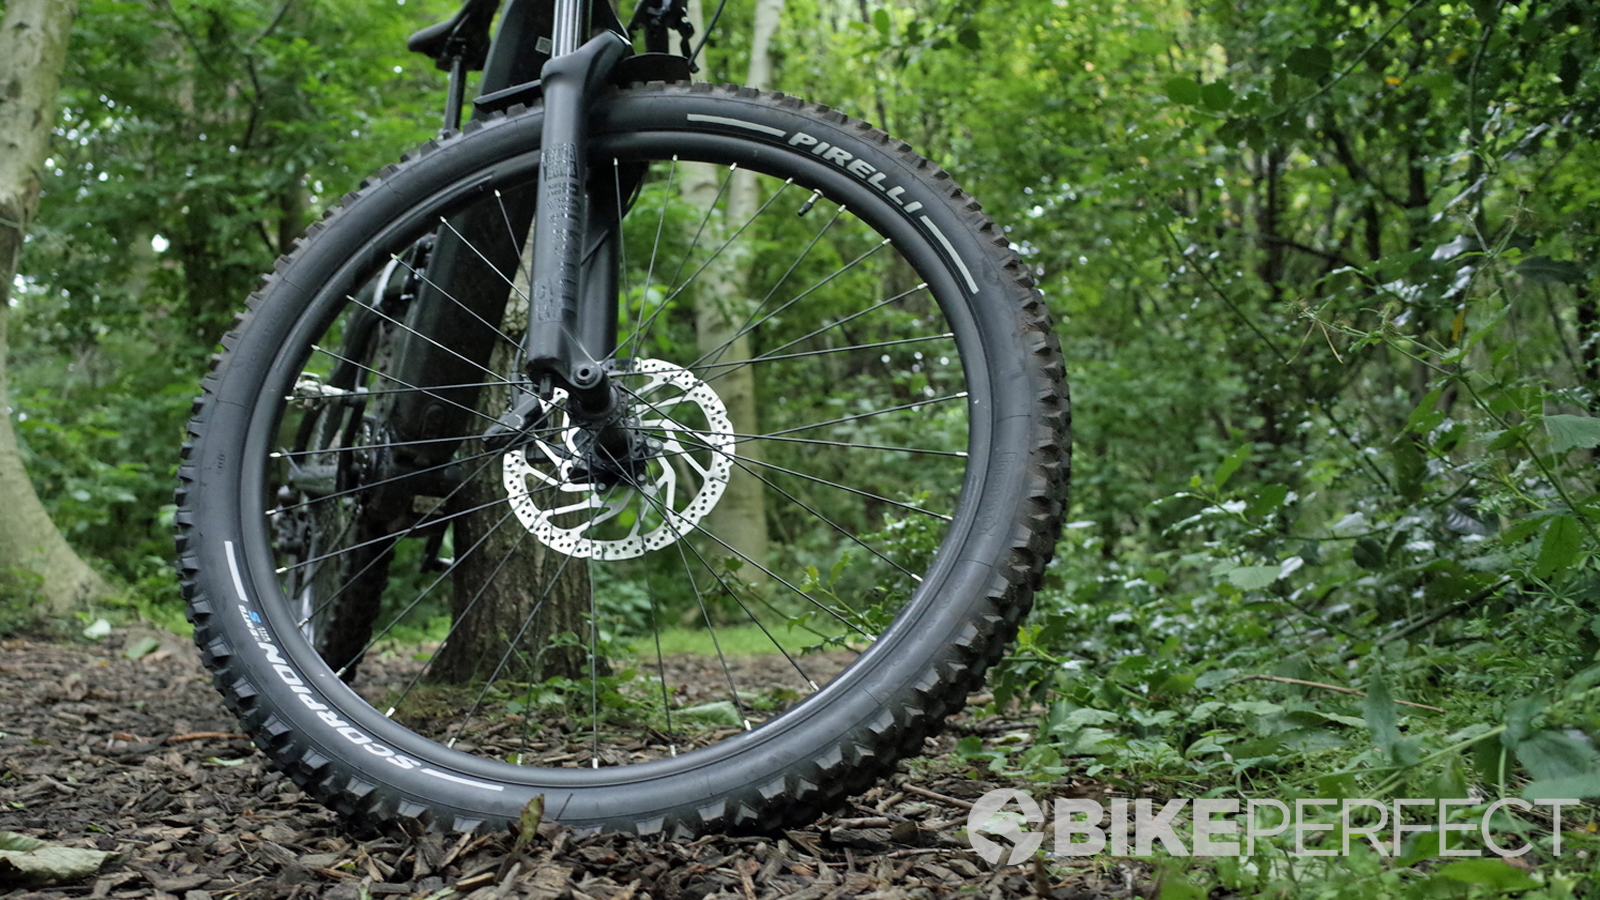 Rubber Tire Bike MTB Pirelli Scorpion Mixed Terrain 27,5 x 2.6 Tubeless